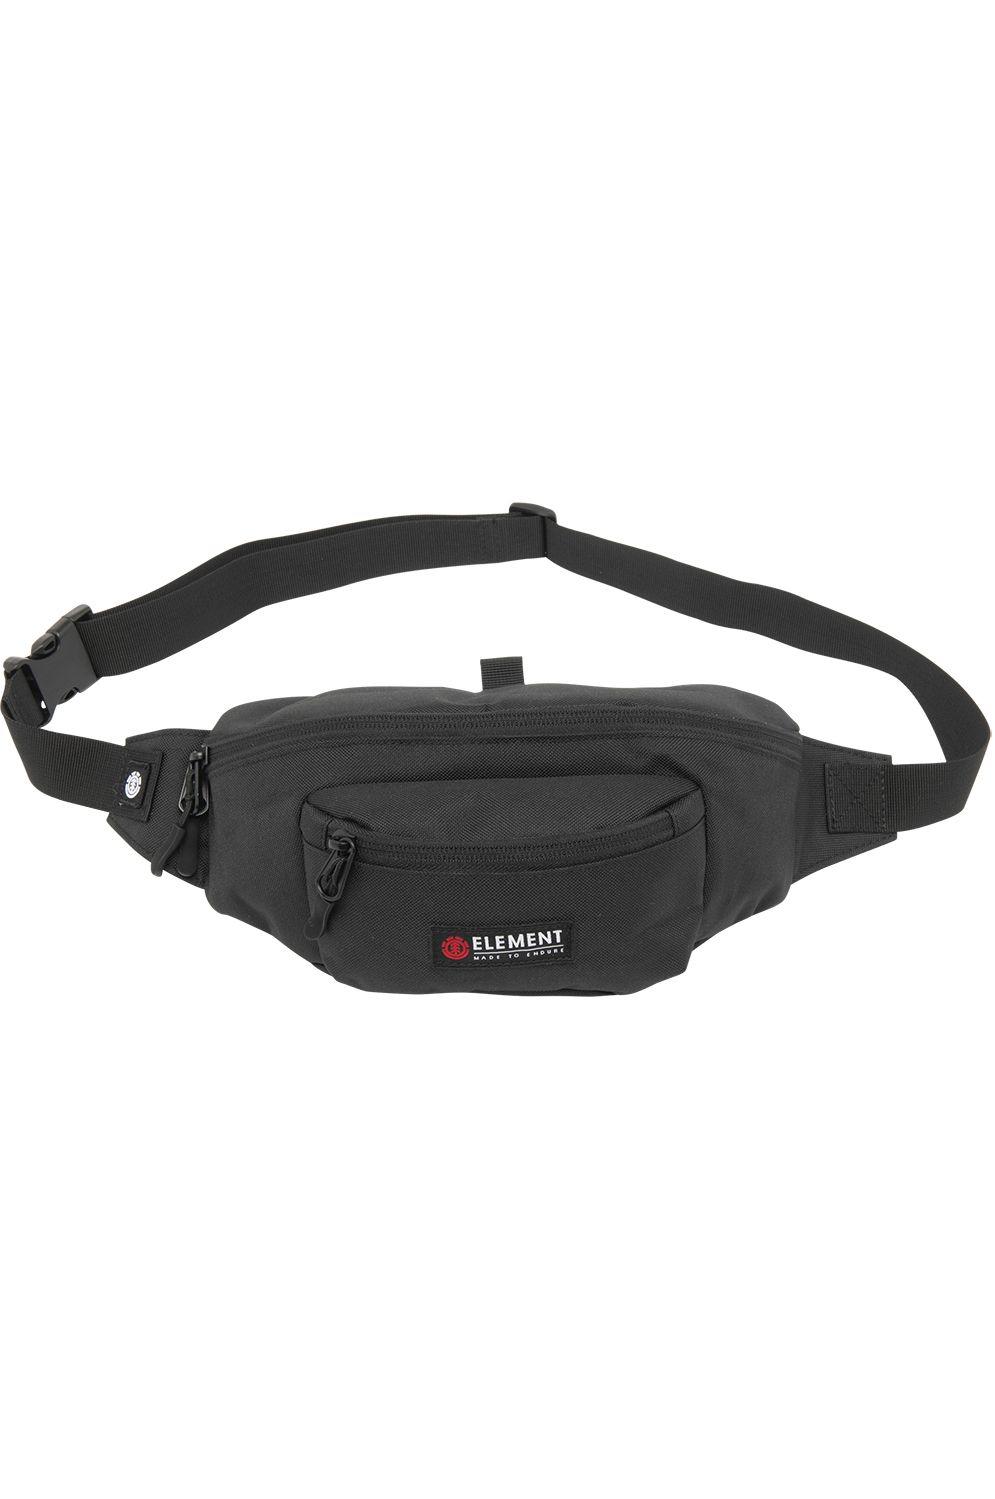 Element Waist Bag POSSE HIP Flint Black